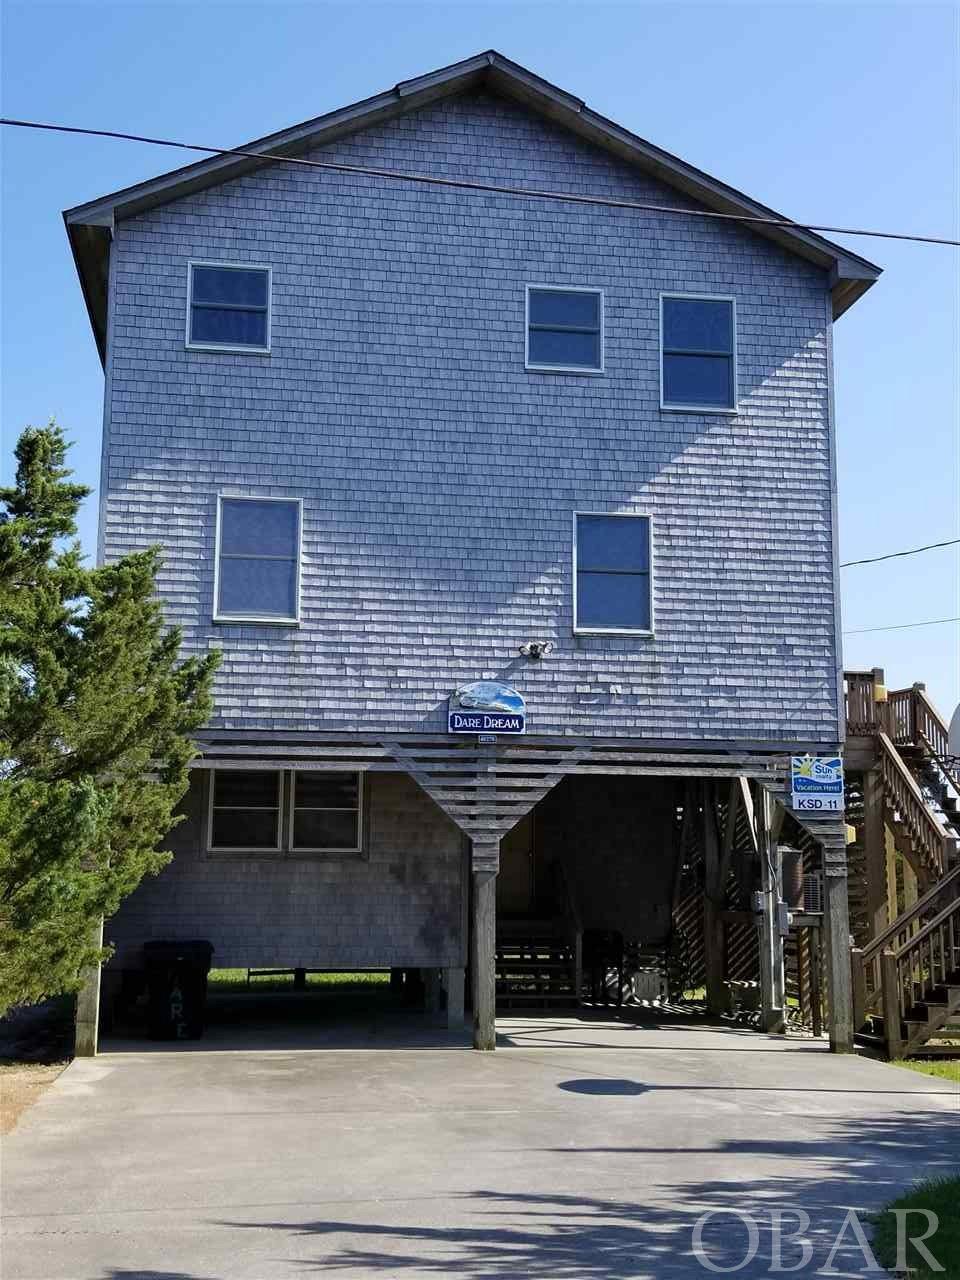 Enjoyable Residential For Sale In Avon North Carolina 100711 Download Free Architecture Designs Sospemadebymaigaardcom